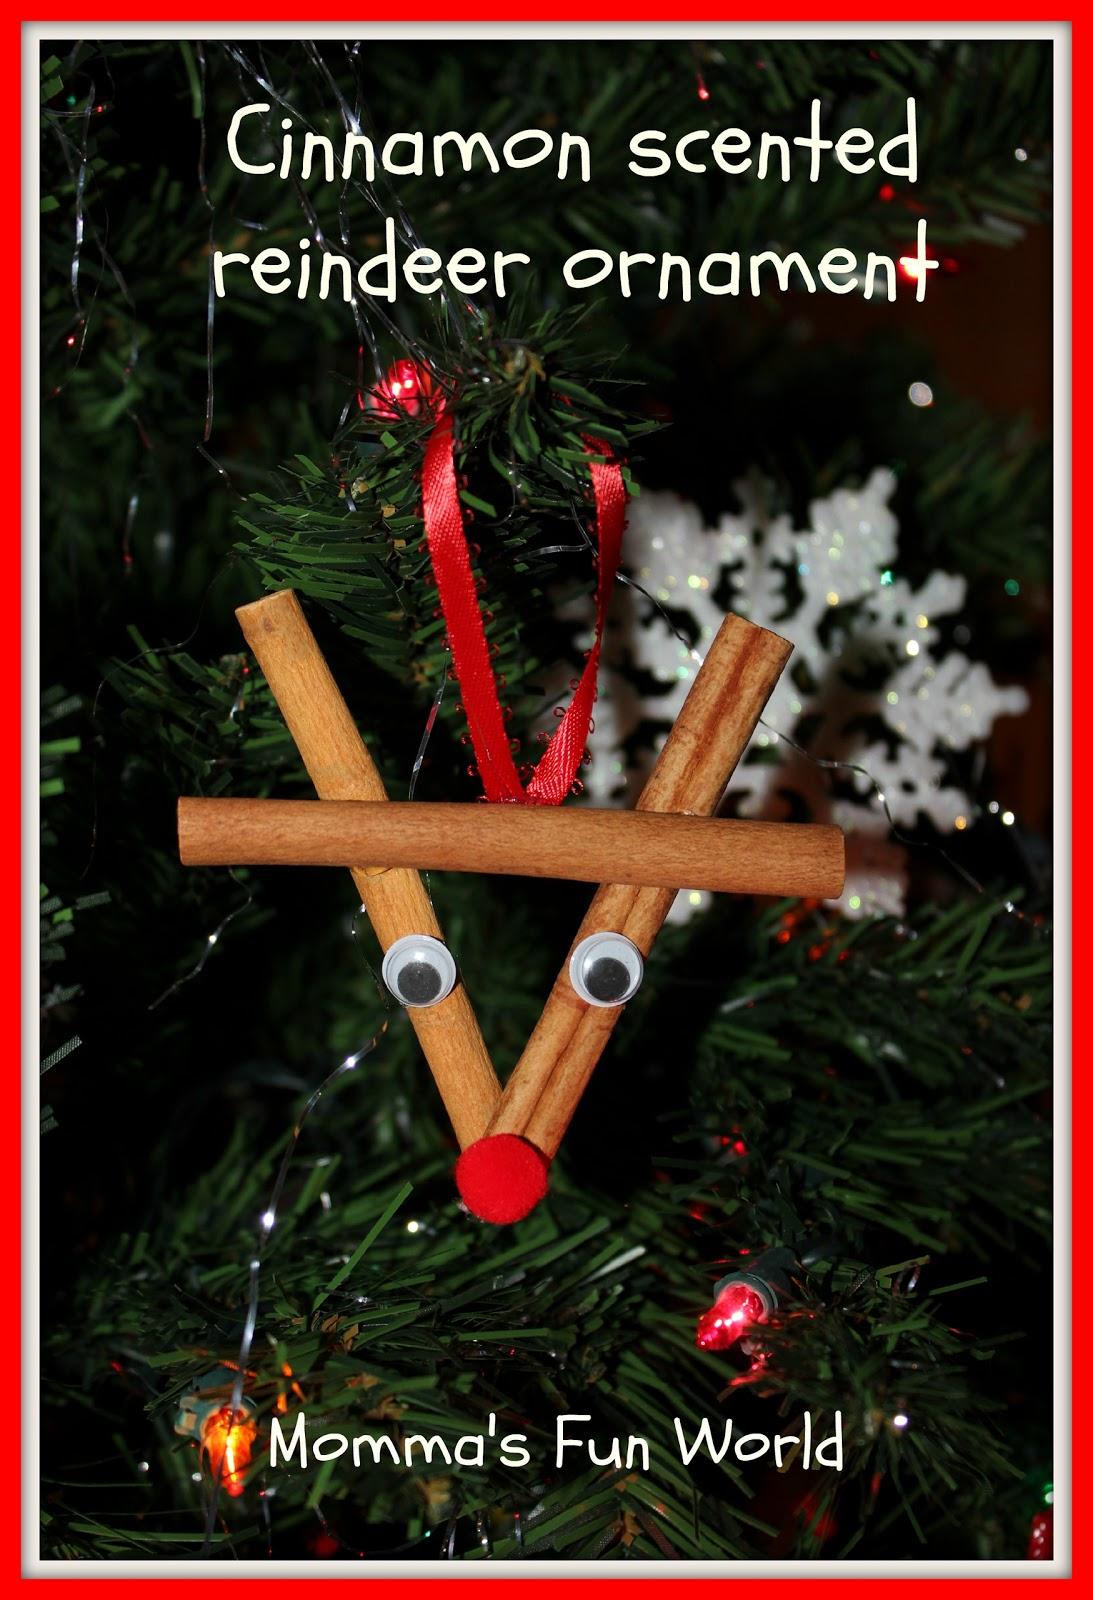 Momma's Fun World: Cinnamon stick reindeer ornament